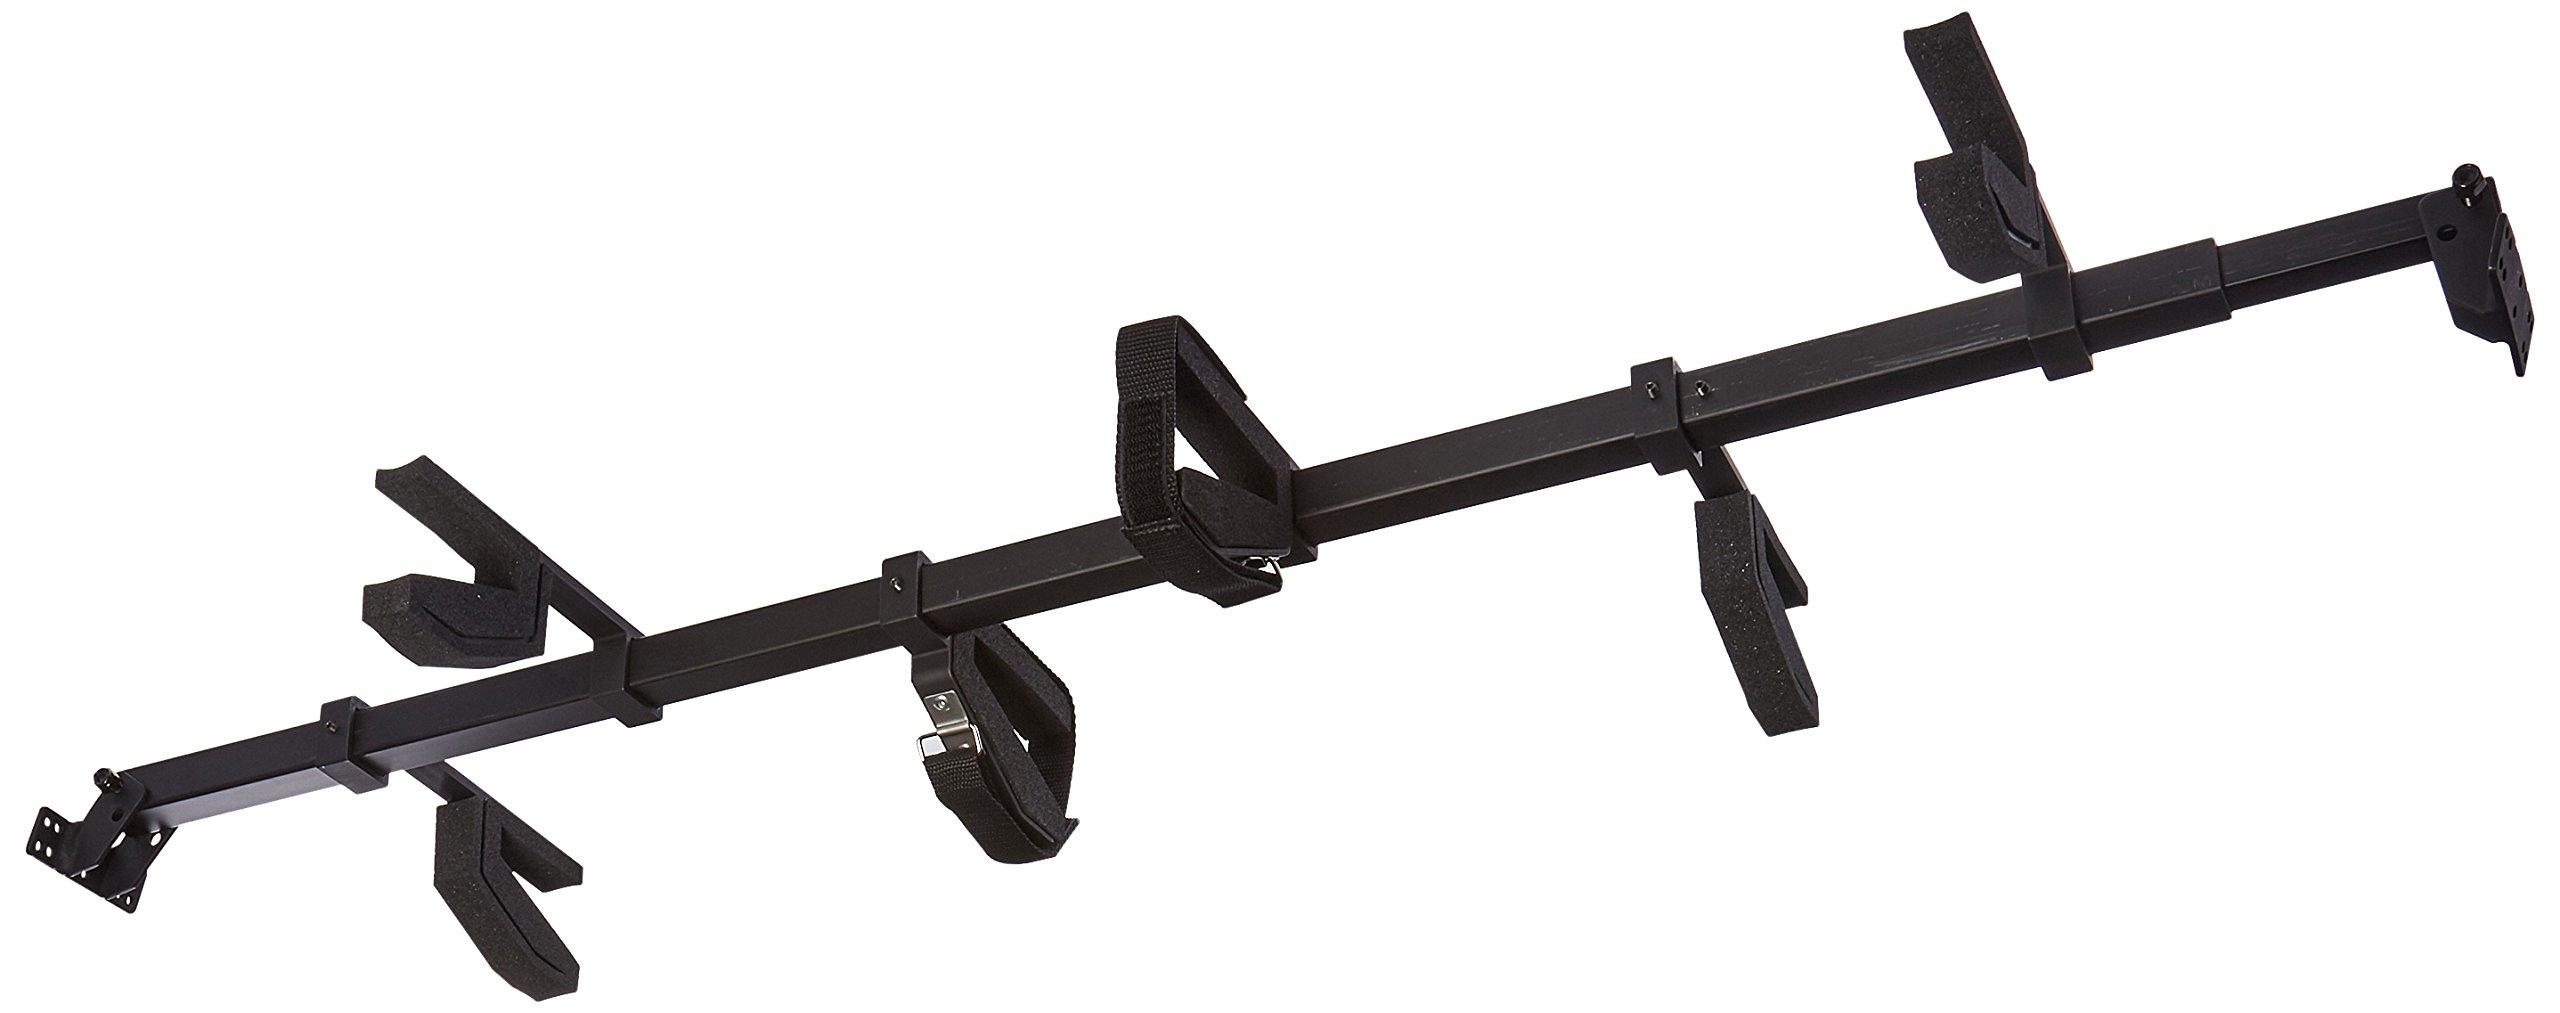 Big Sky SBR-2G Gun Rack 2-Gun Sky Bar